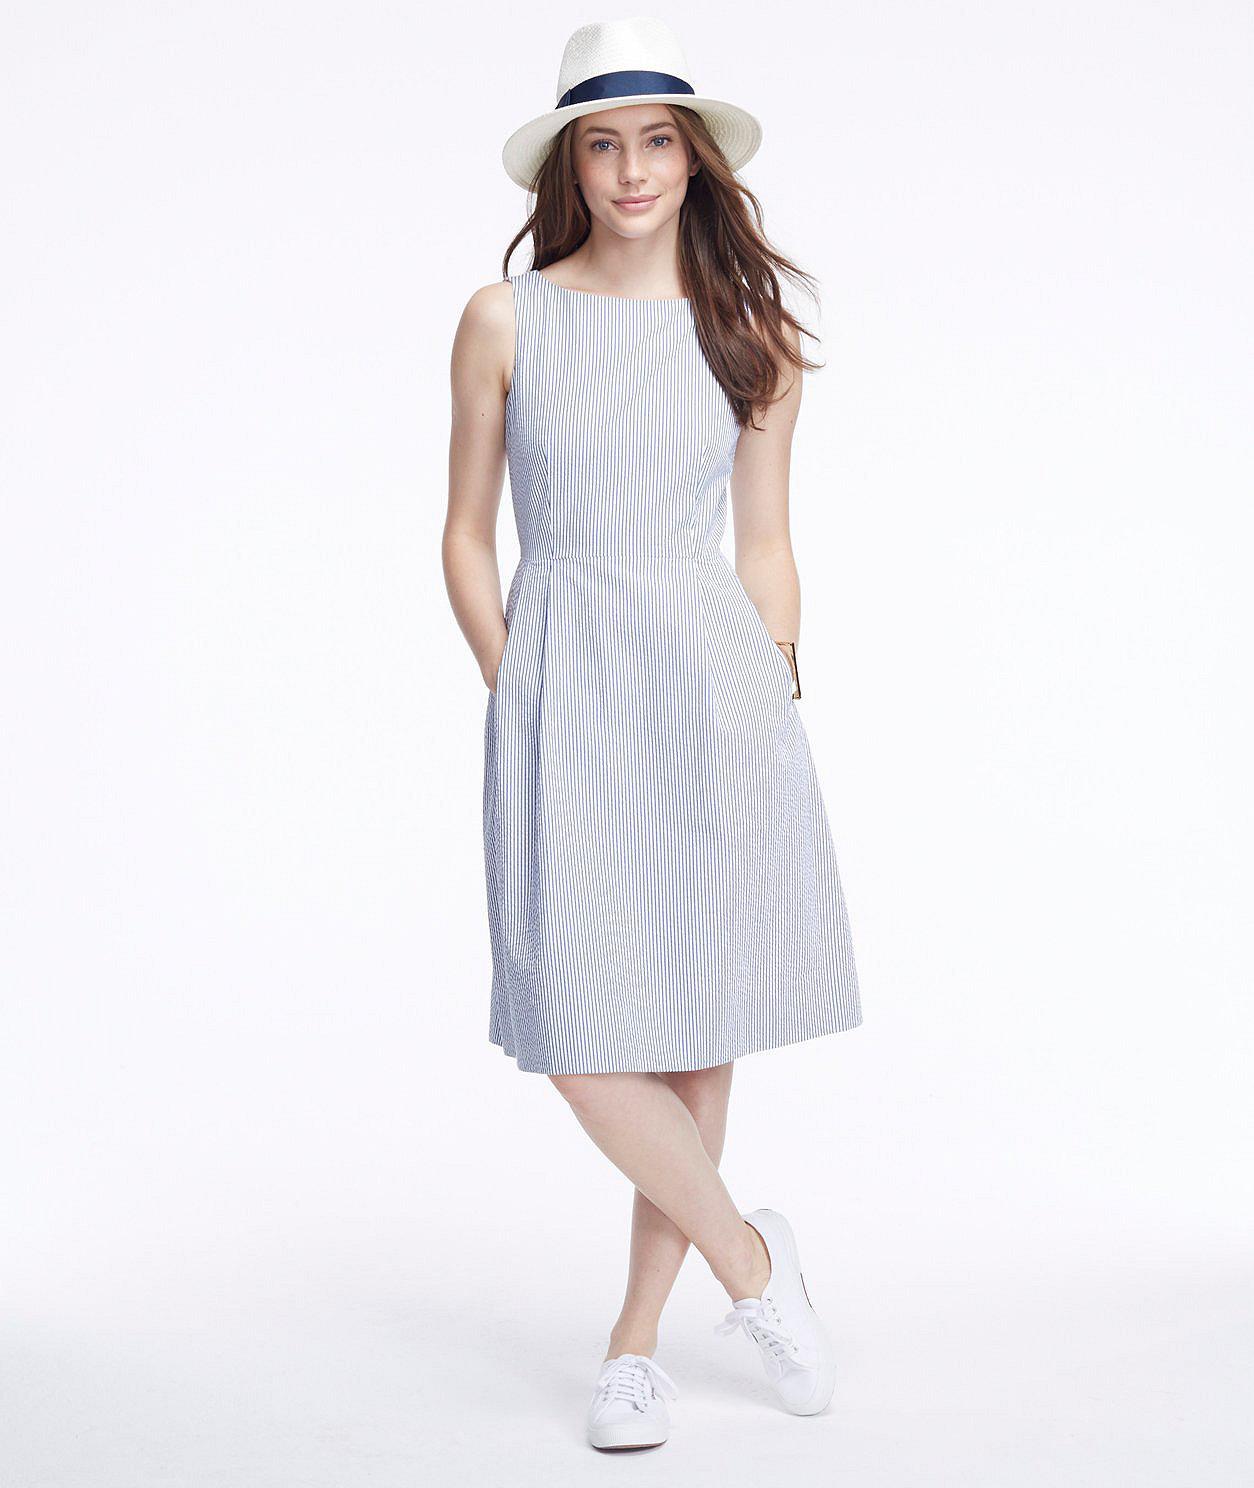 Women's Signature Seersucker Dress, Stripe   Free Shipping at L.L.Bean